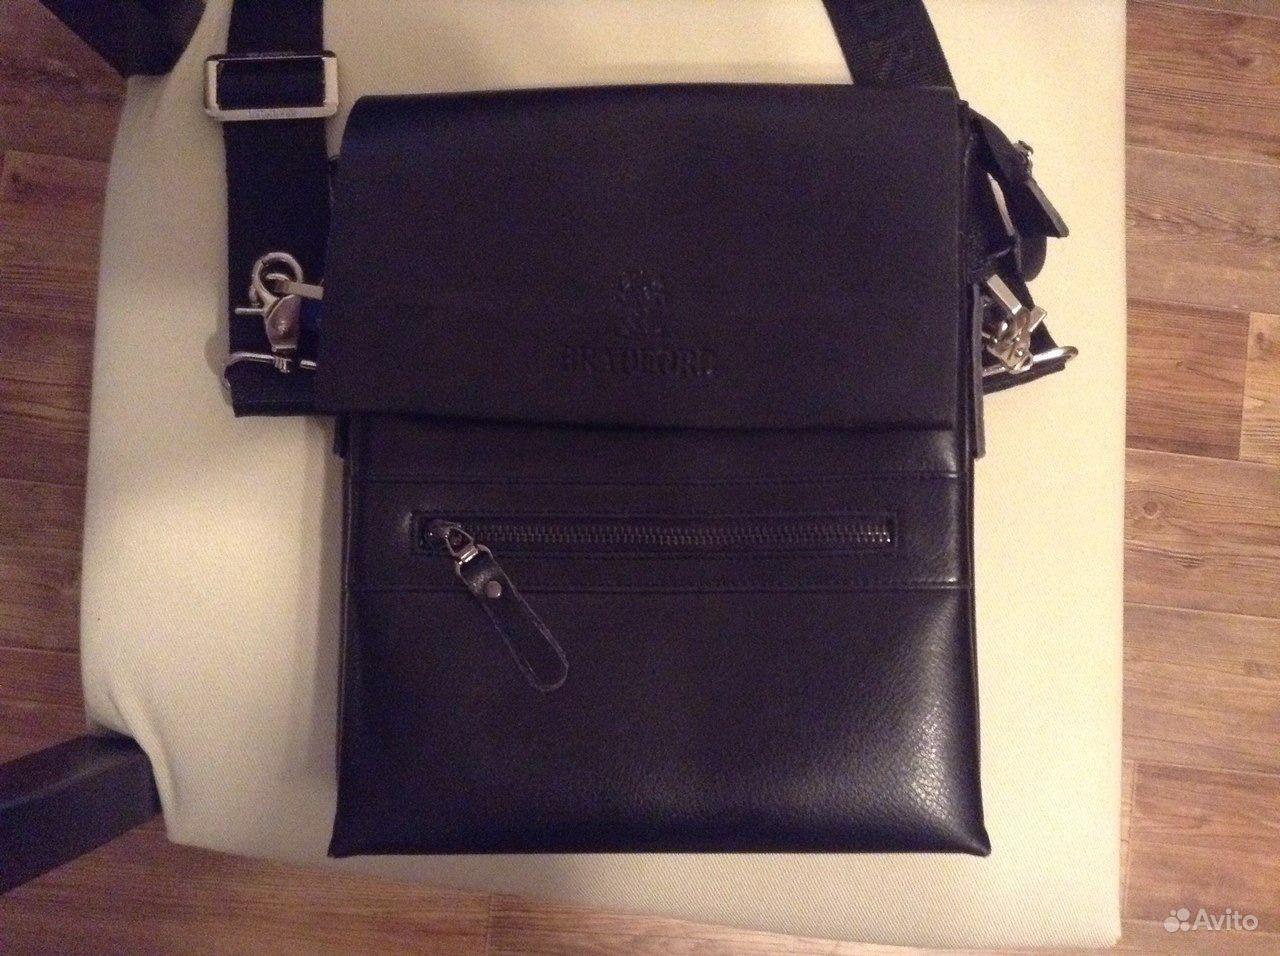 e3554d6f45f5 Maximumawolaing — Кожаные мужские сумки bradford